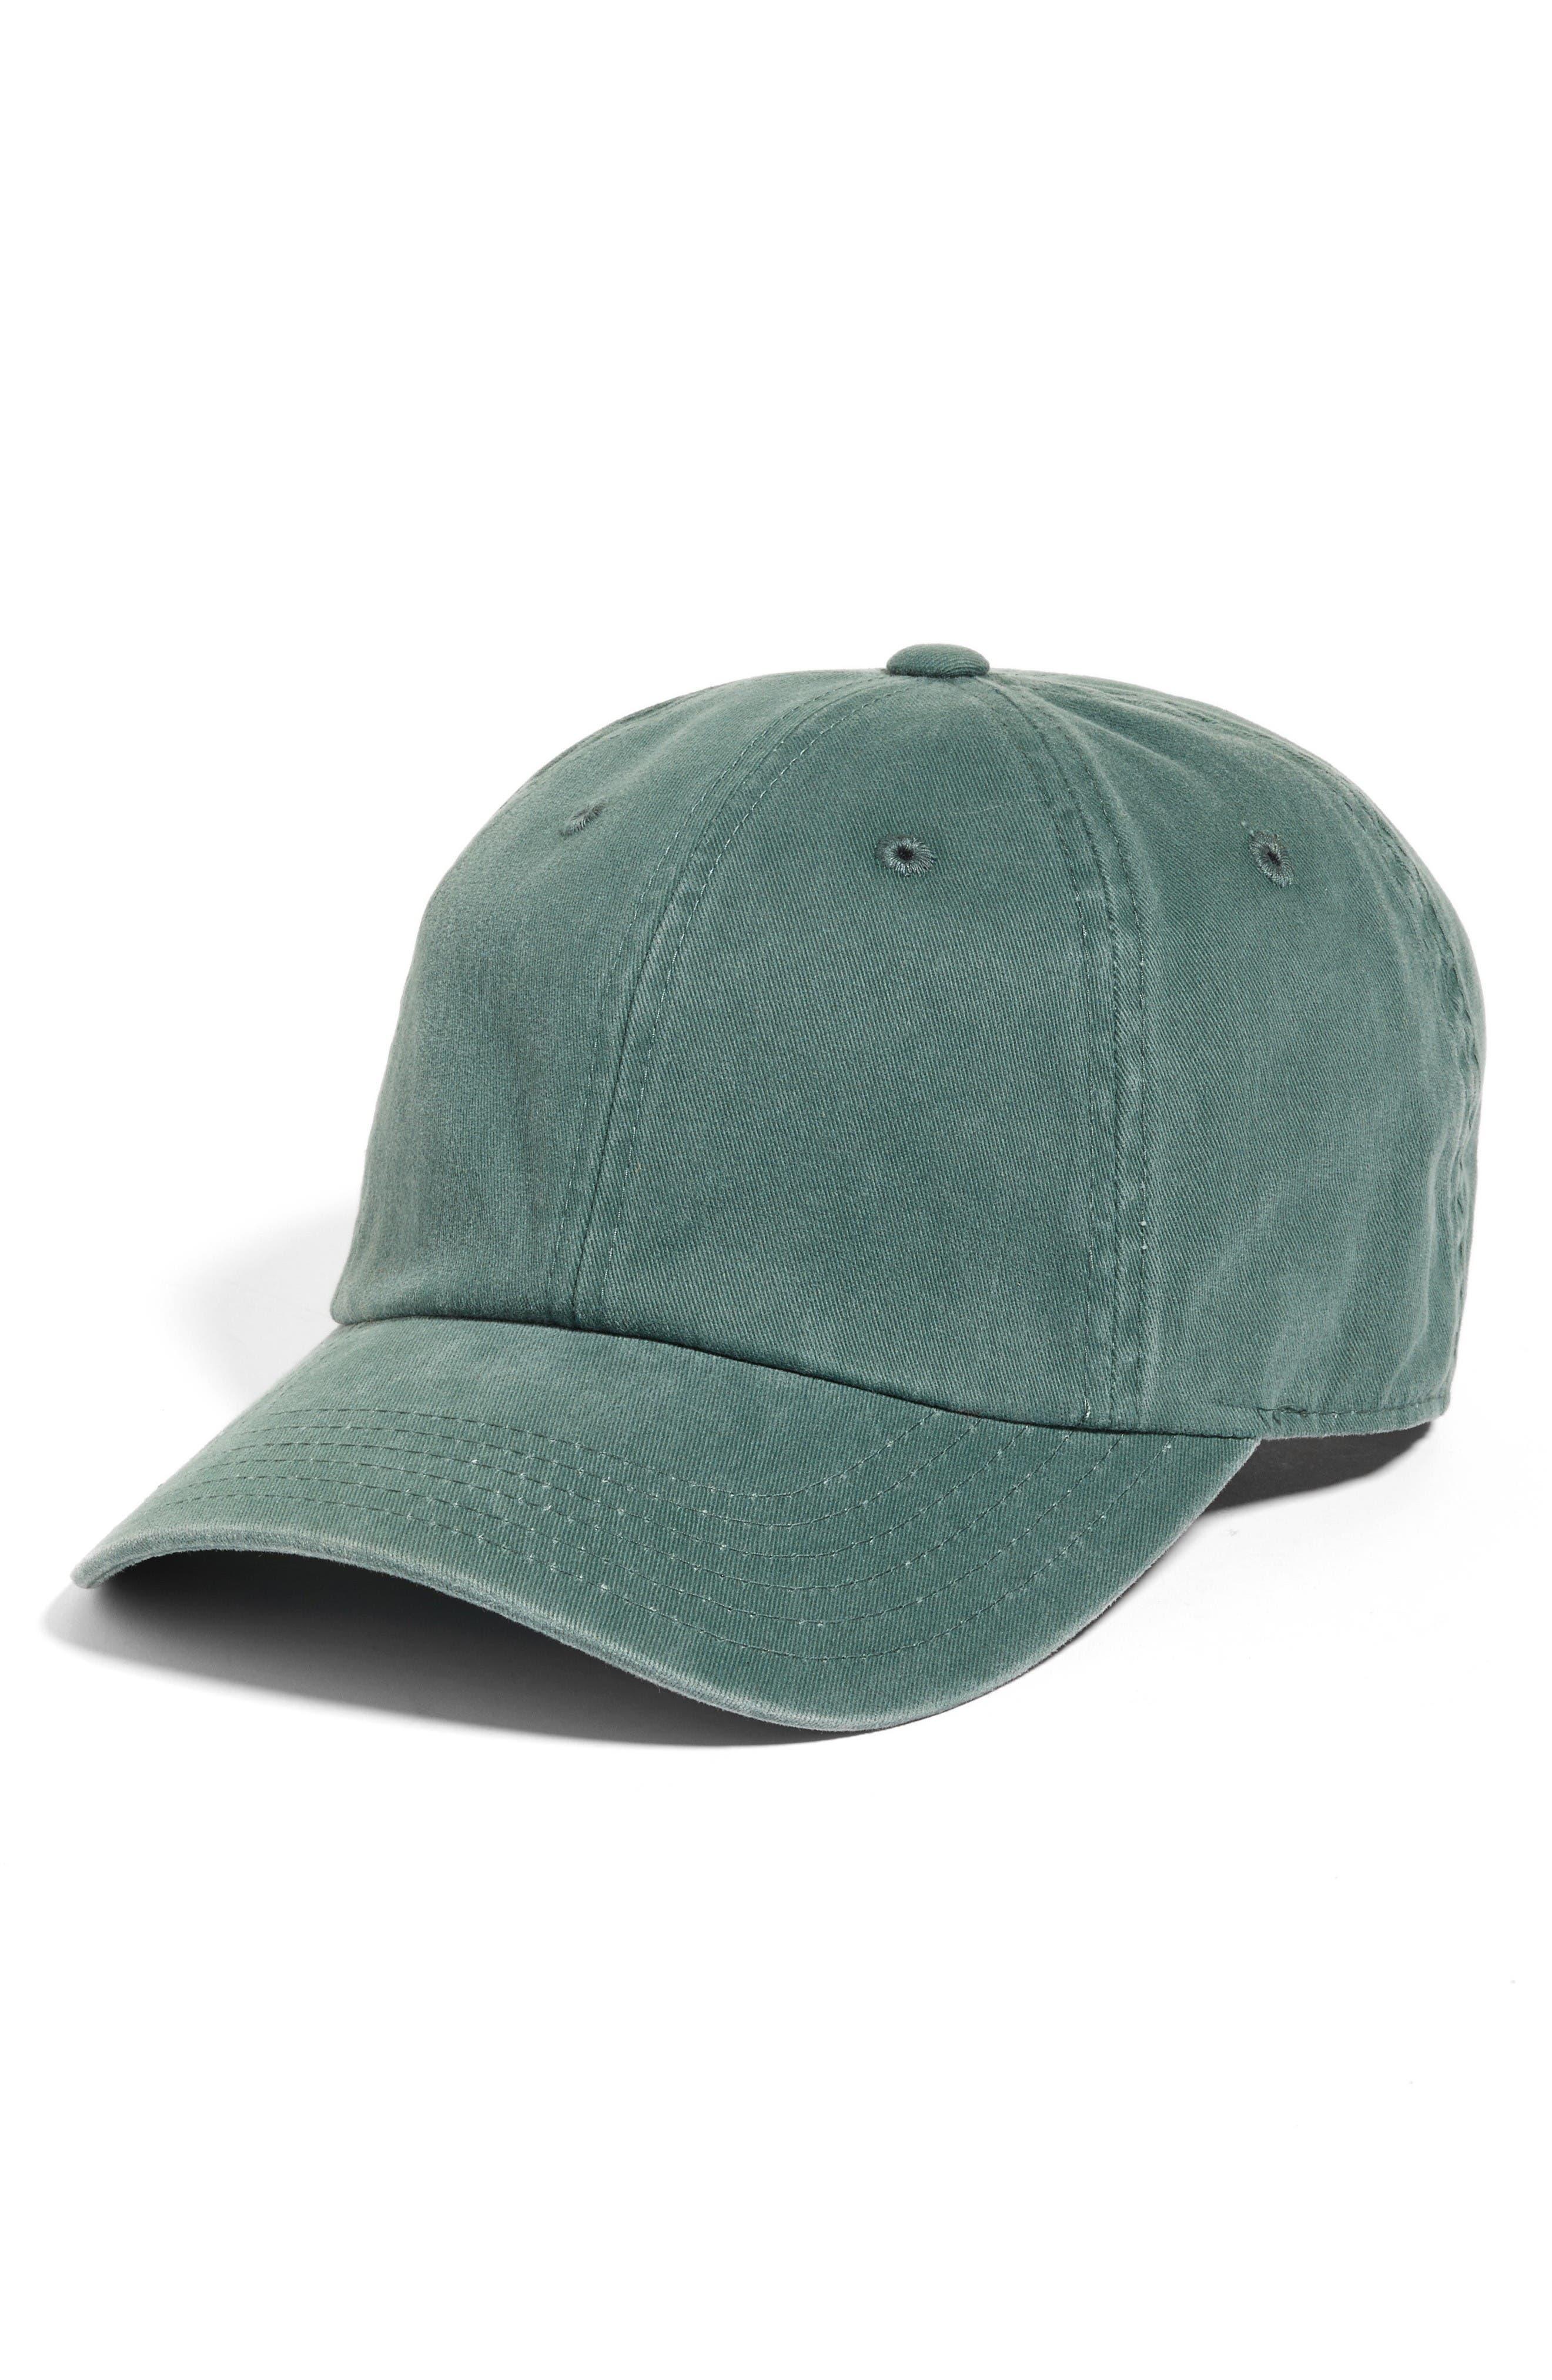 Alternate Image 1 Selected - American Needle Washed Baseball Cap